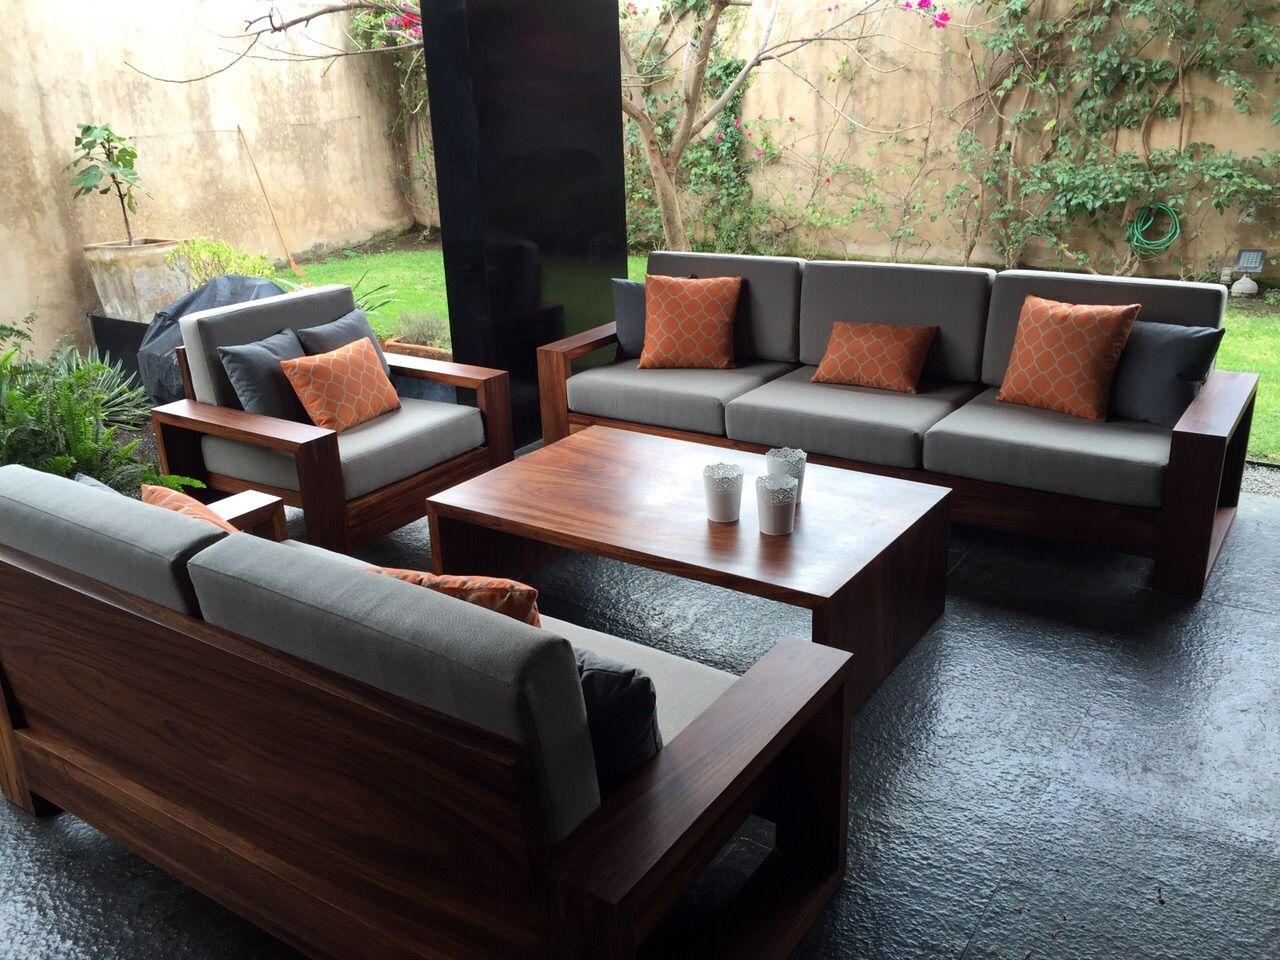 Transmuta guadalajara muebles de madera arquitectura for Disenos de salas